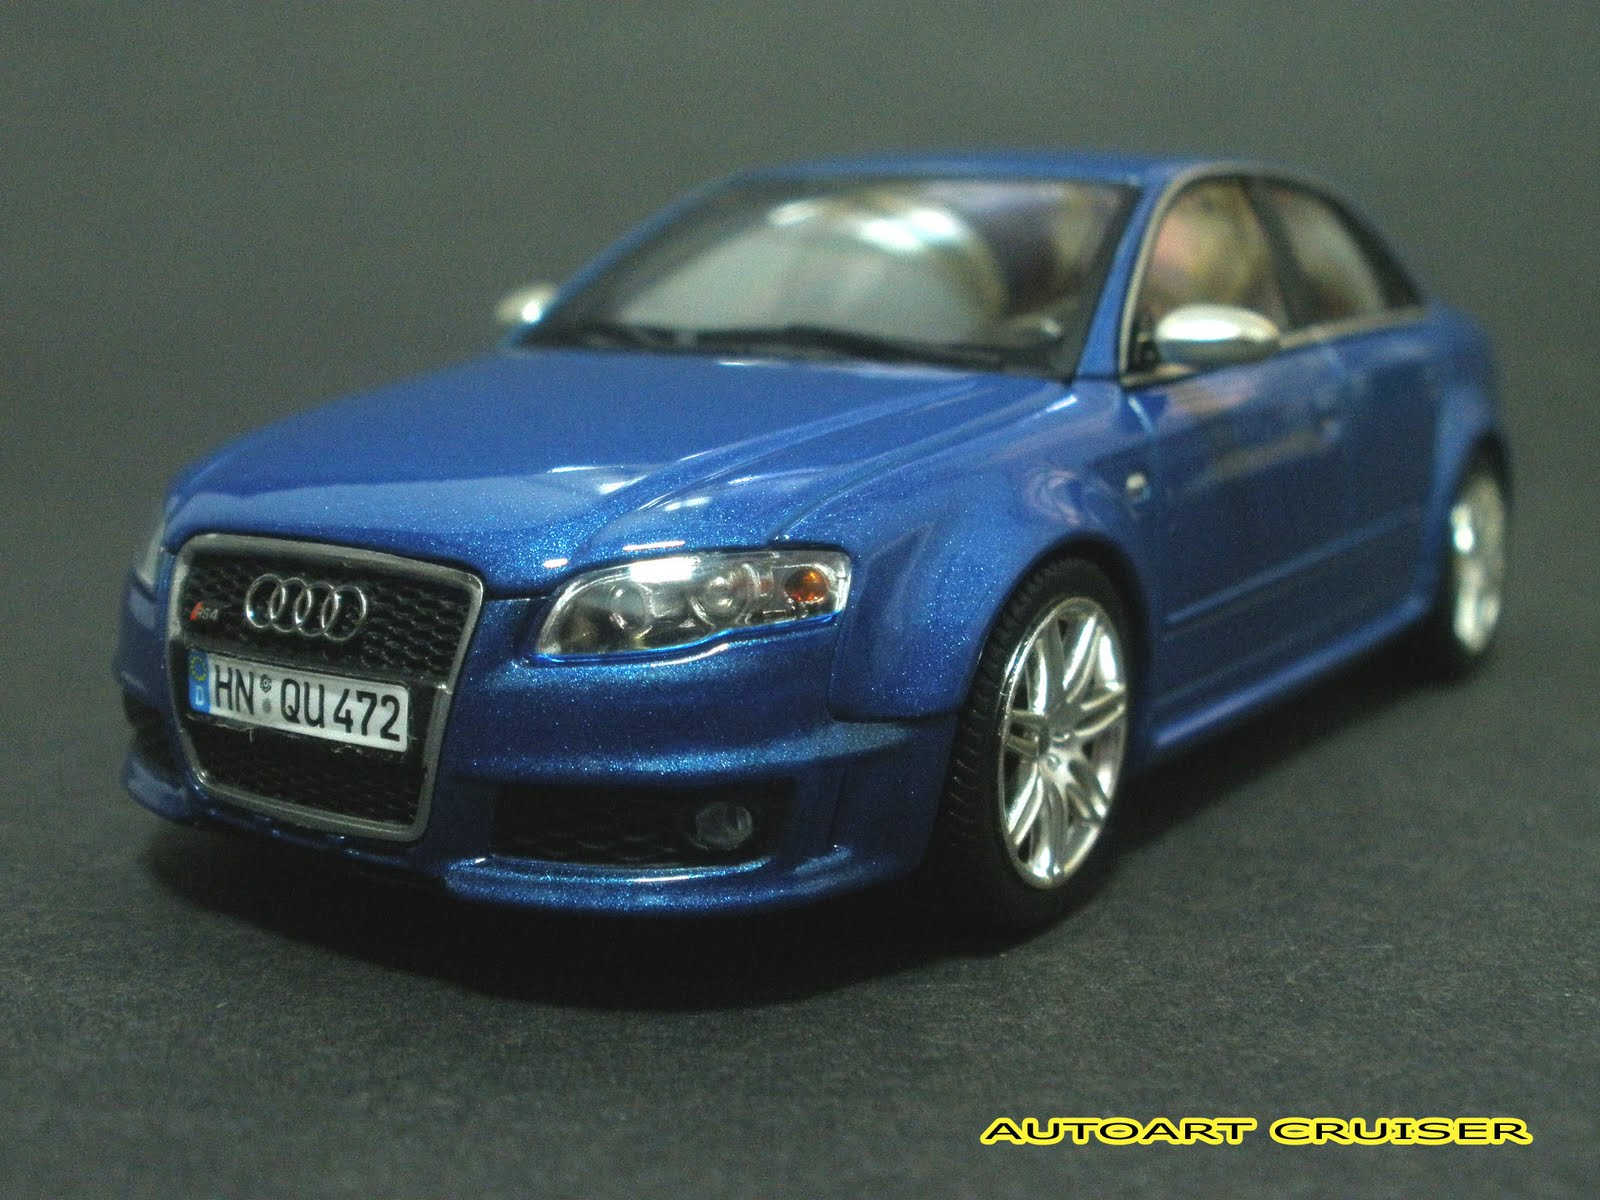 Autoart Cruiser My Collection For Minichamps Audi RS Sport Sedan - 2005 audi rs4